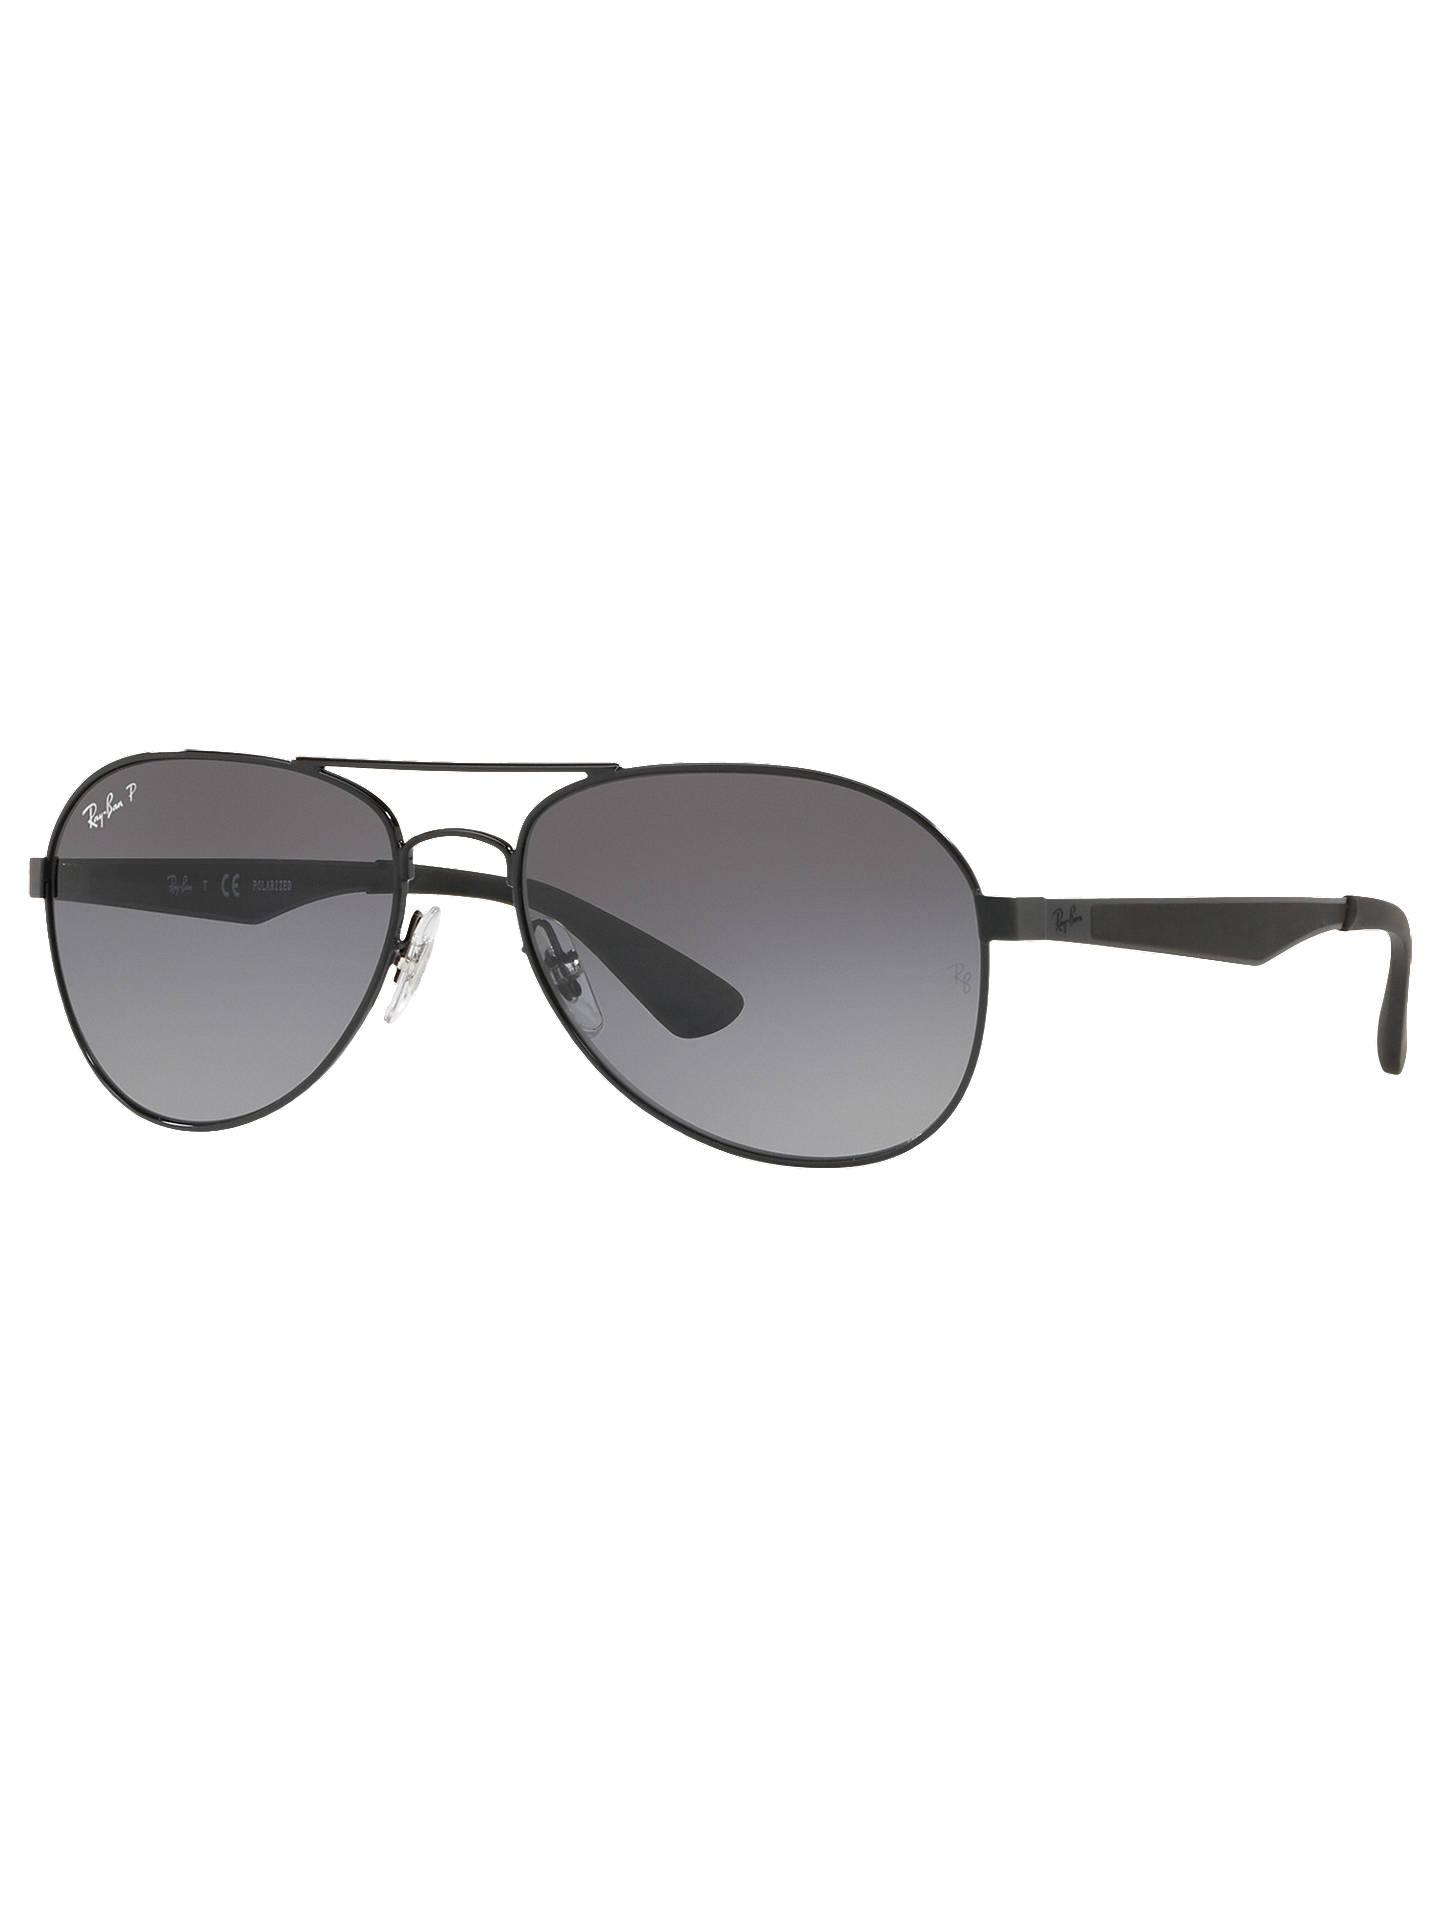 9e80d384b Buy Ray-Ban RB3549 Polarised Aviator Sunglasses, Shiny Black/Grey Gradient  Online at ...